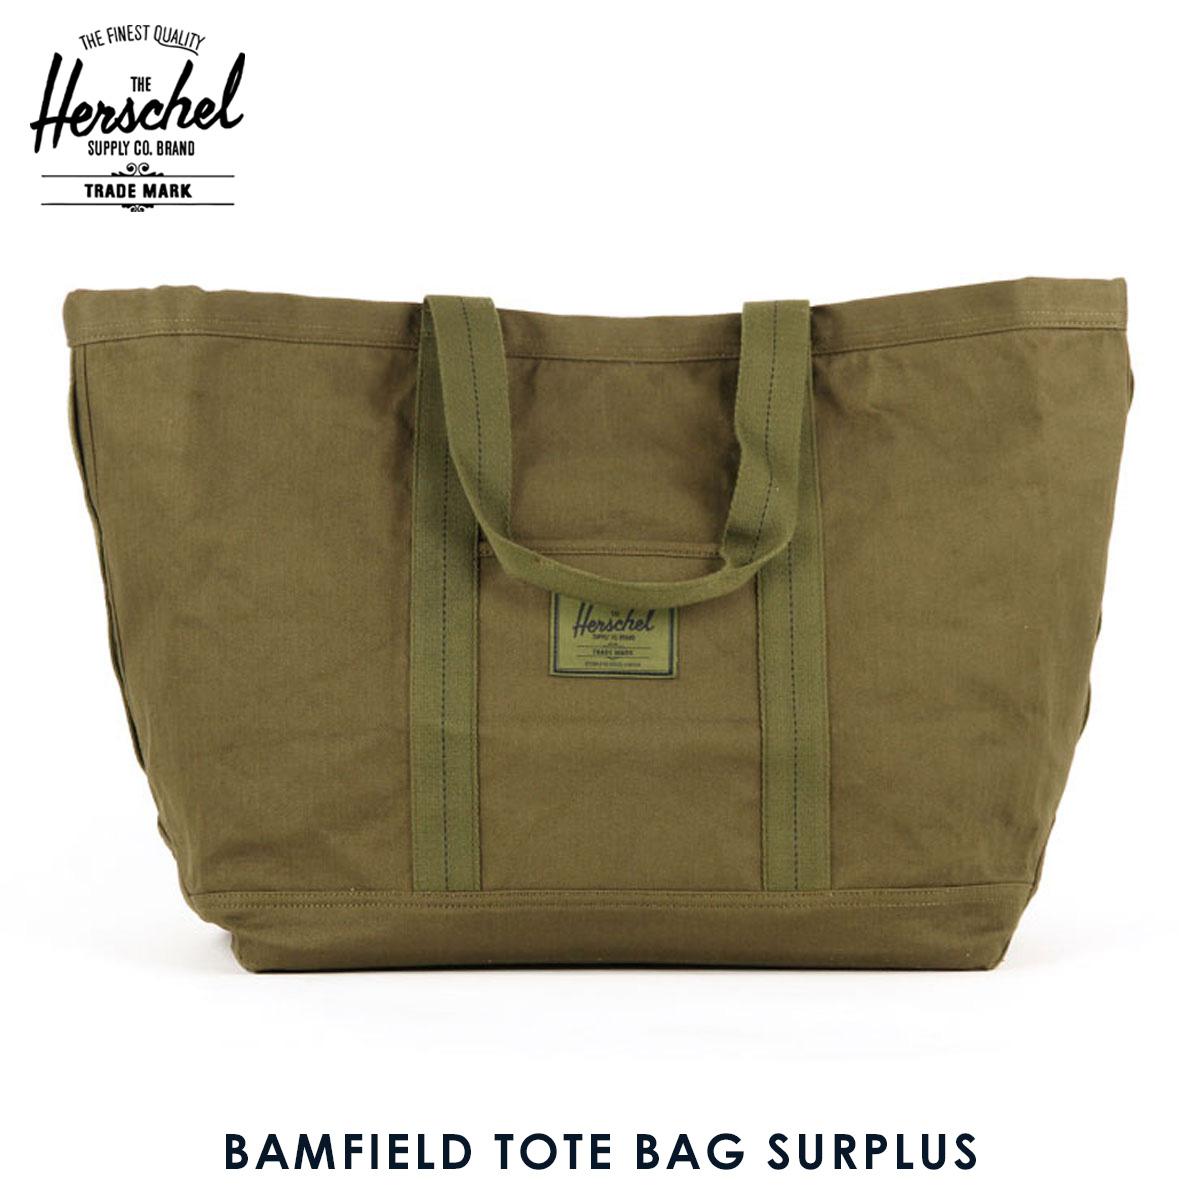 Herschel supply Herschel Supply regular sale shop bag BAMFIELD TOTE BAG  SURPLUS 10232-01131-OS ARMY 20P03Dec16 c3912f531ad37